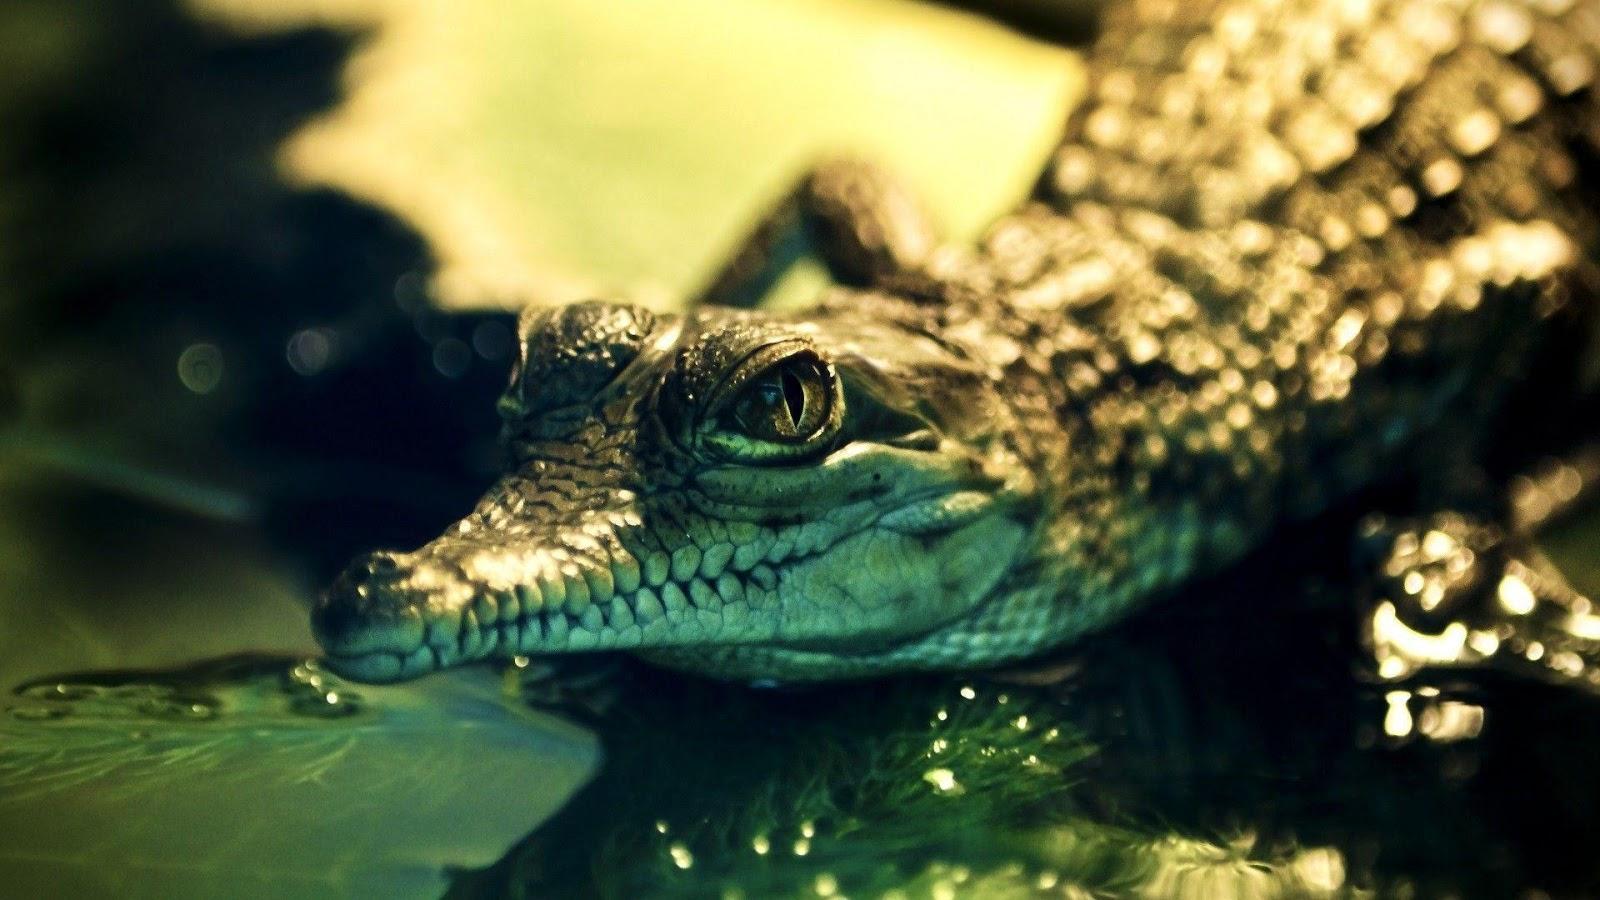 Nice Alligator HD Wallpapers Download animal wallpaper